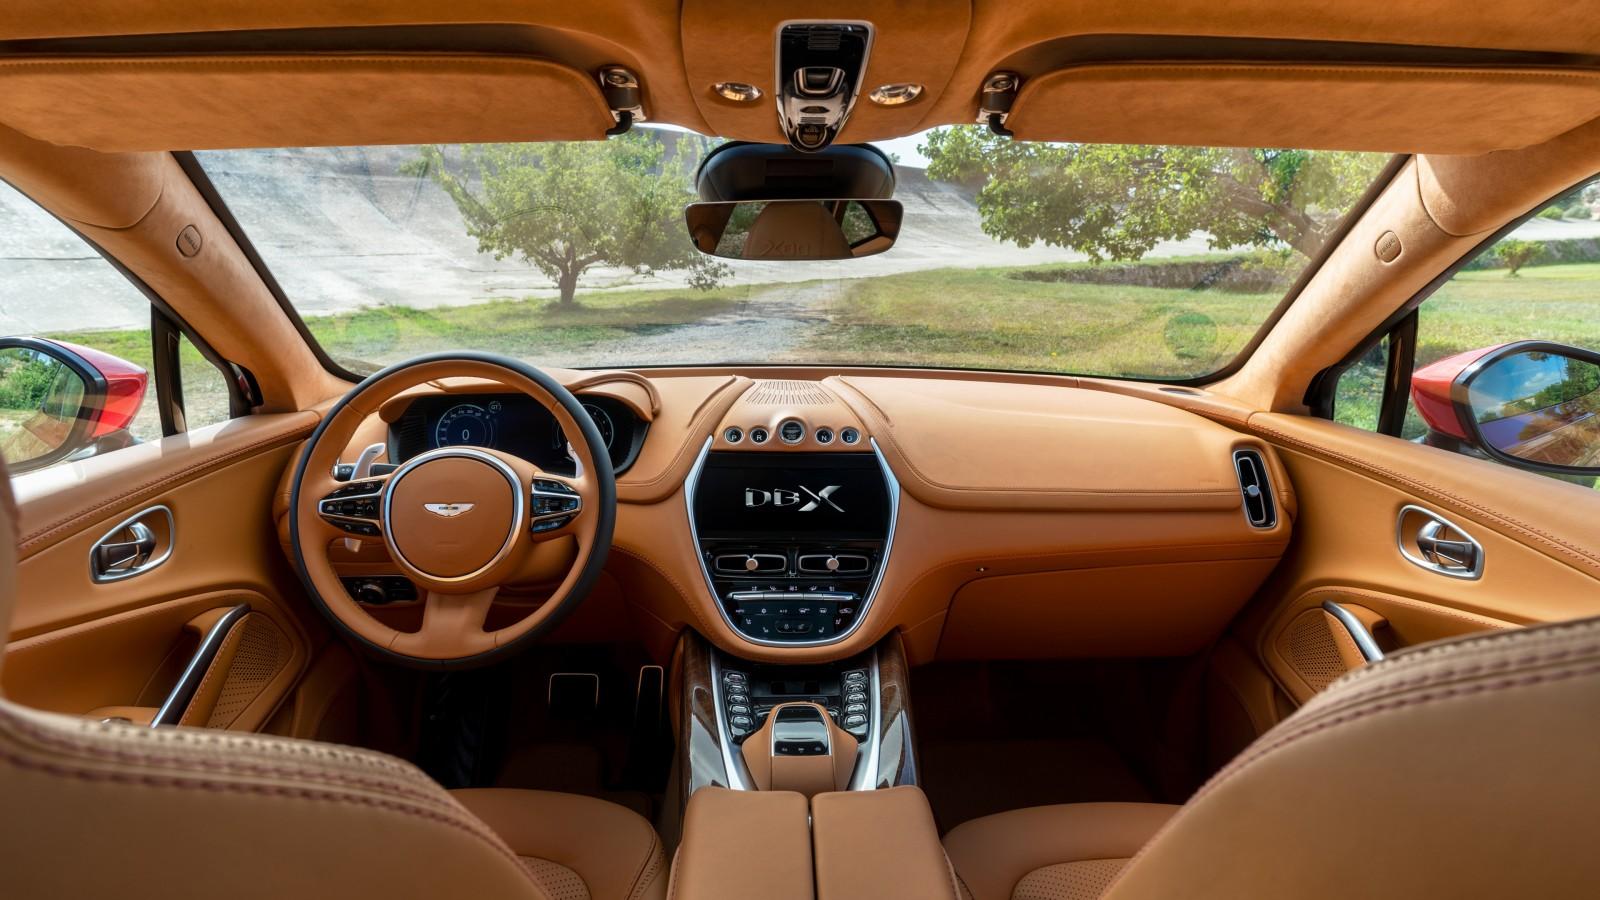 Aston Martin DBX 2020 Interior Wallpaper | HD Car ...